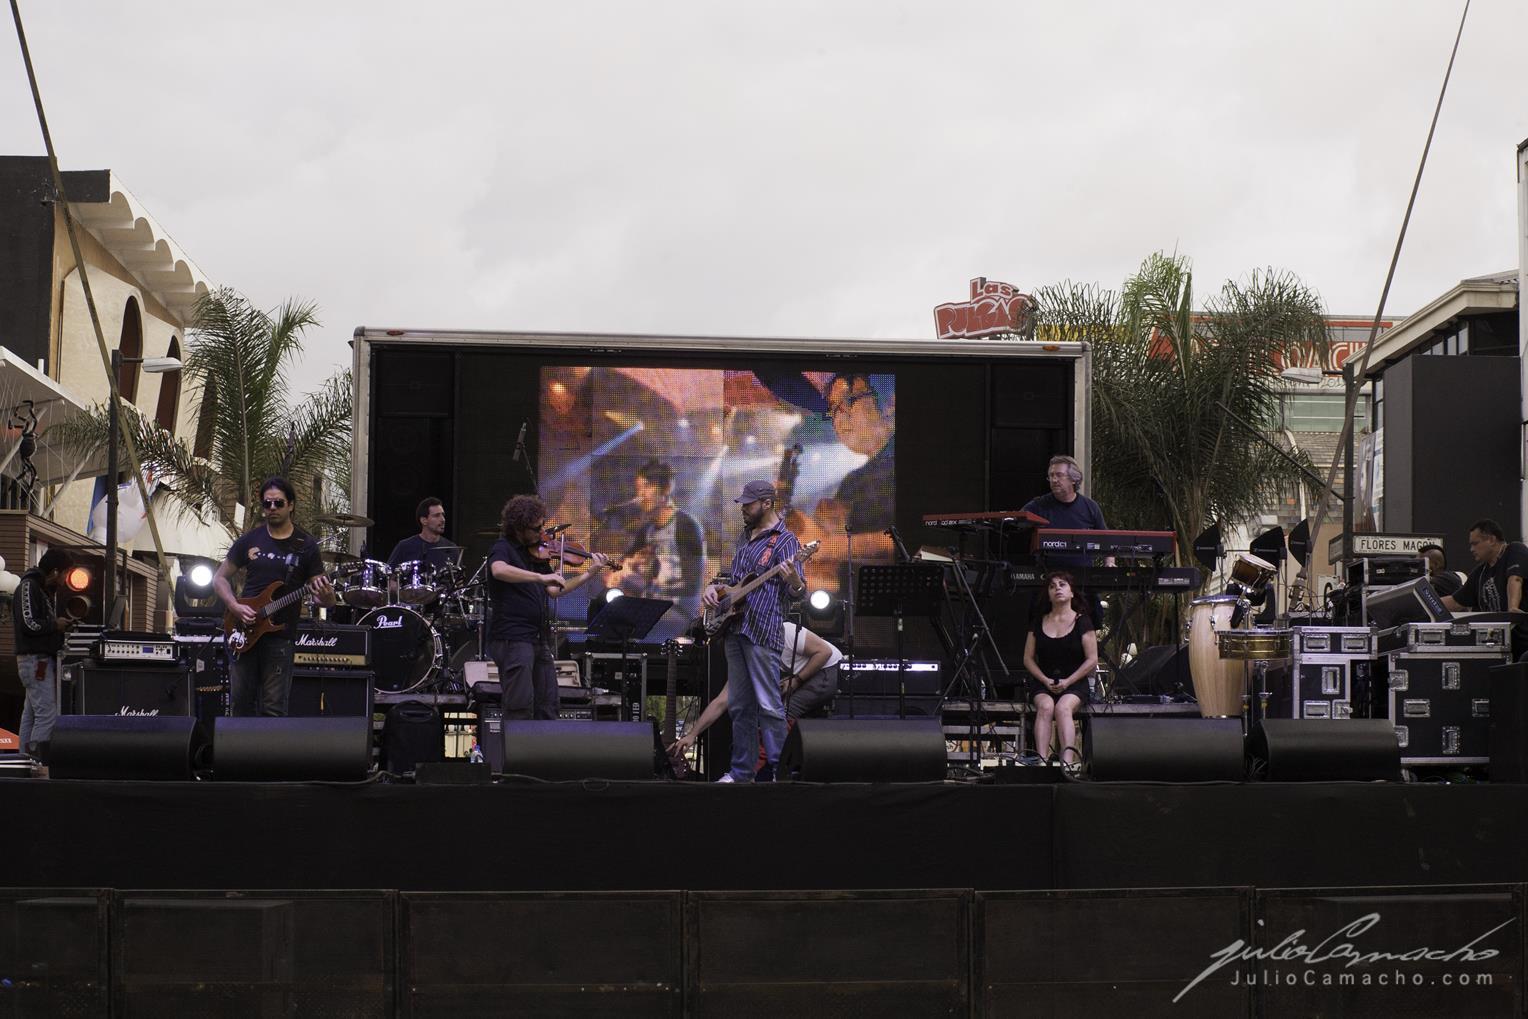 2014-10-30 31 CAST TOUR Ensenada y Tijuana - 1185 - www.Juli (Copy).jpg